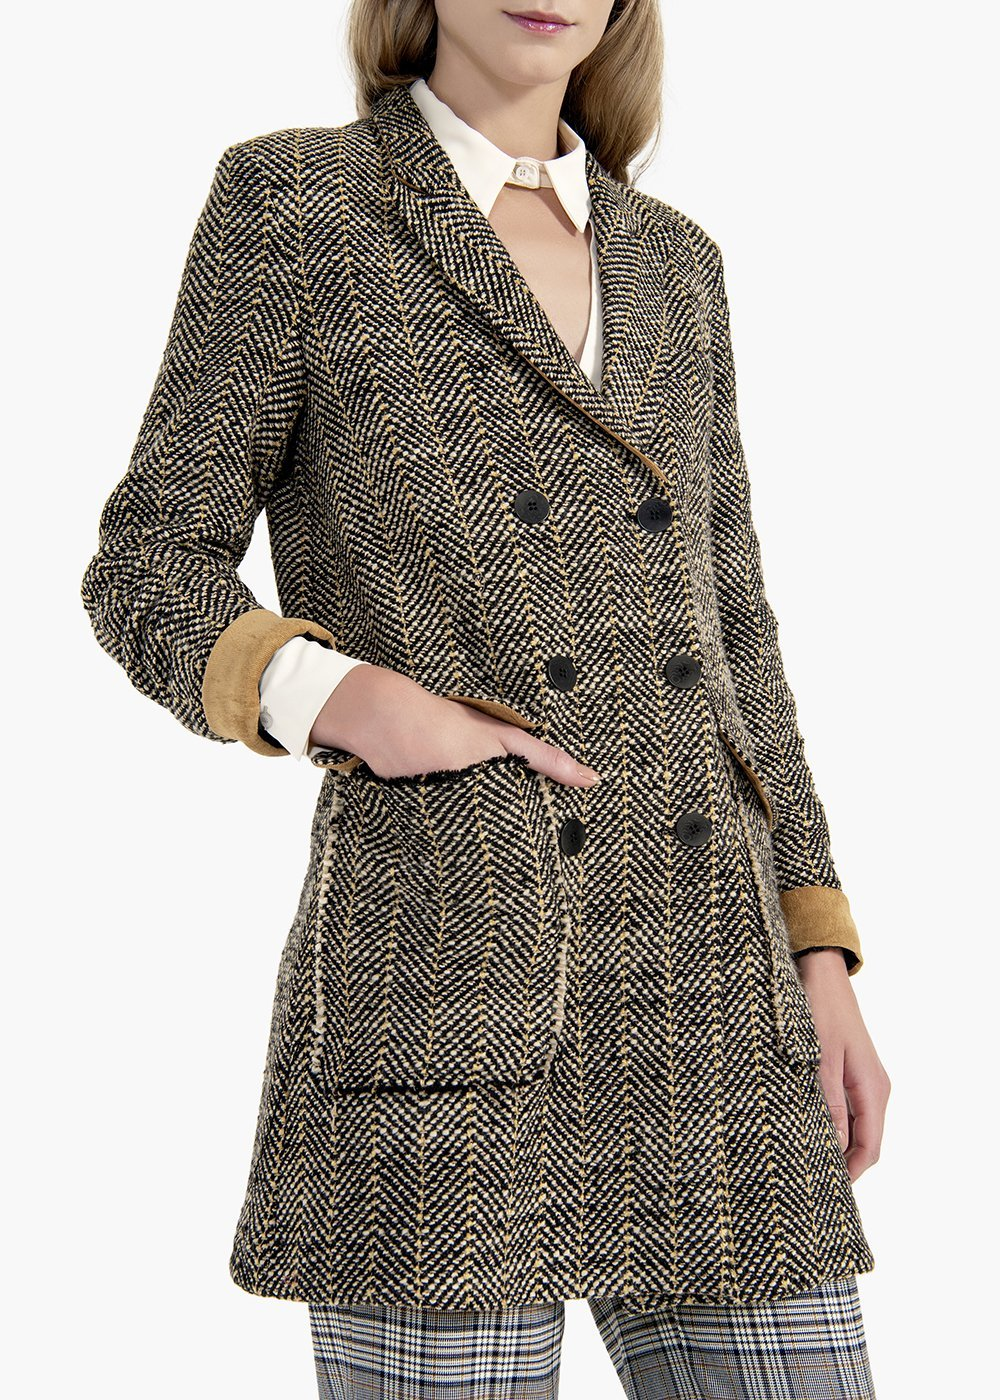 Conny double-breasted coat in herringbone fabric - Mostarda / Black Fantasia - Woman